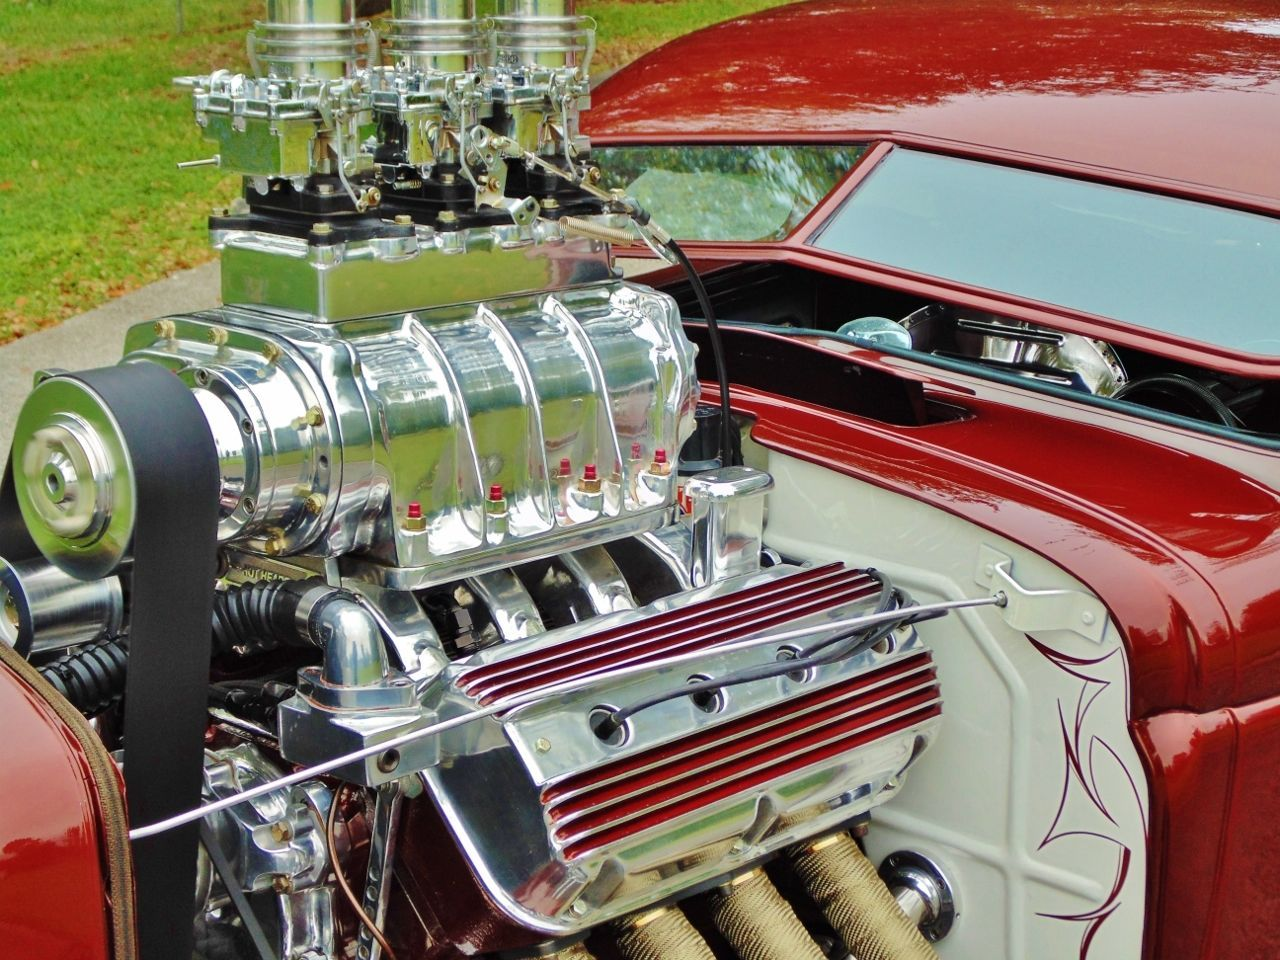 1940 dodge power wagon hot rod rat rod show car blown hemi